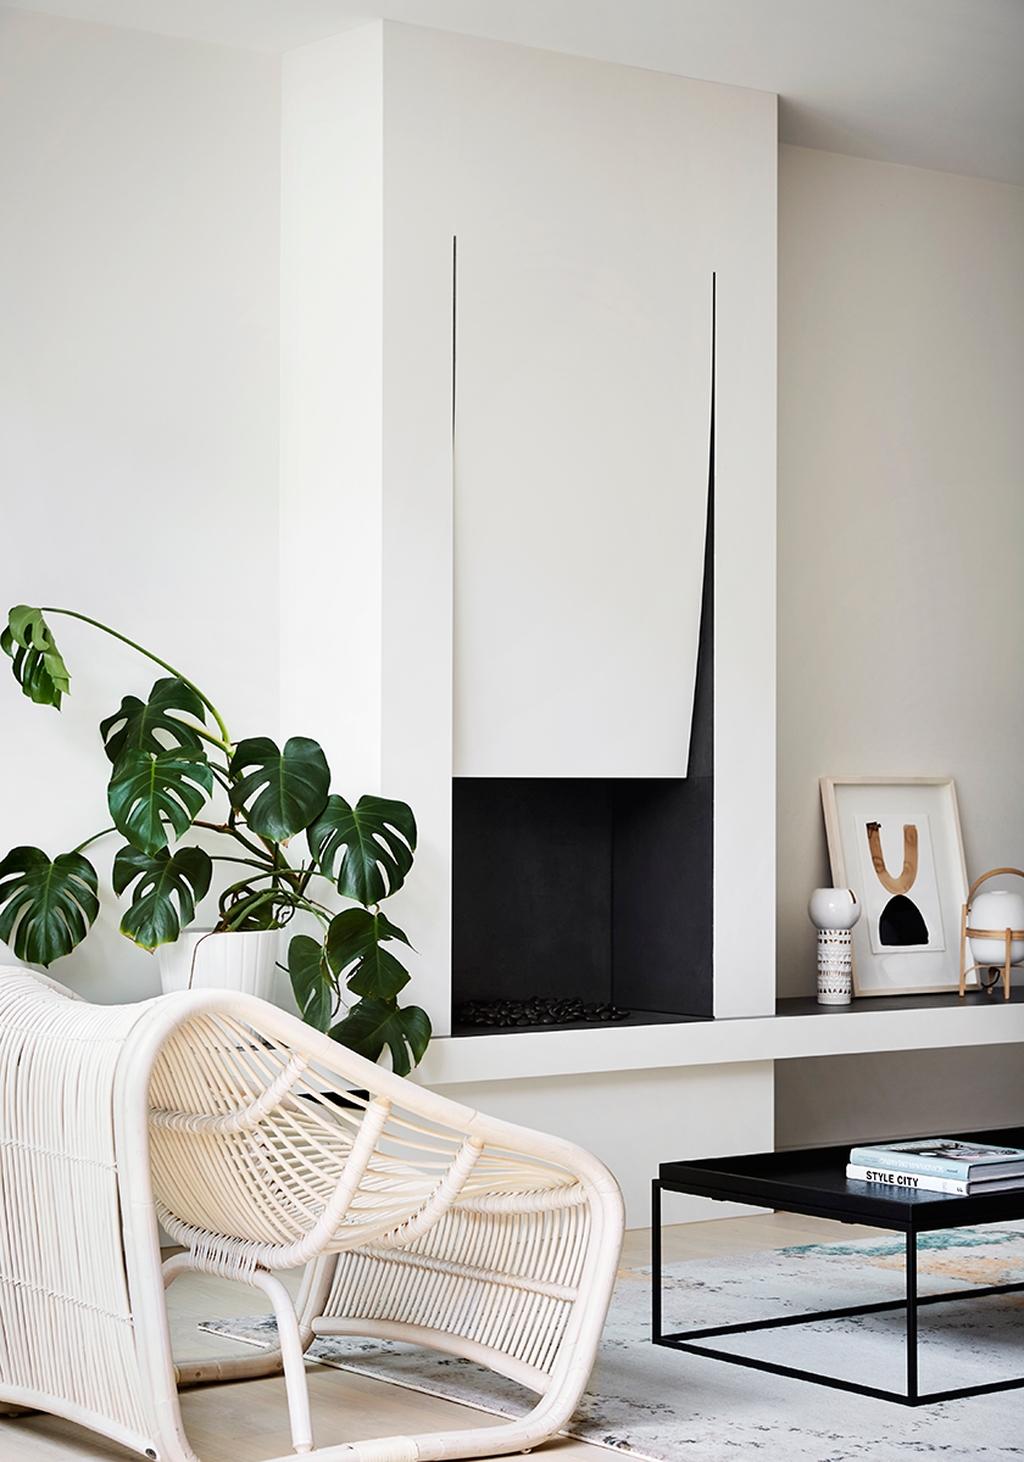 Awesome Modern Minimalist Home Decor Ideas 19